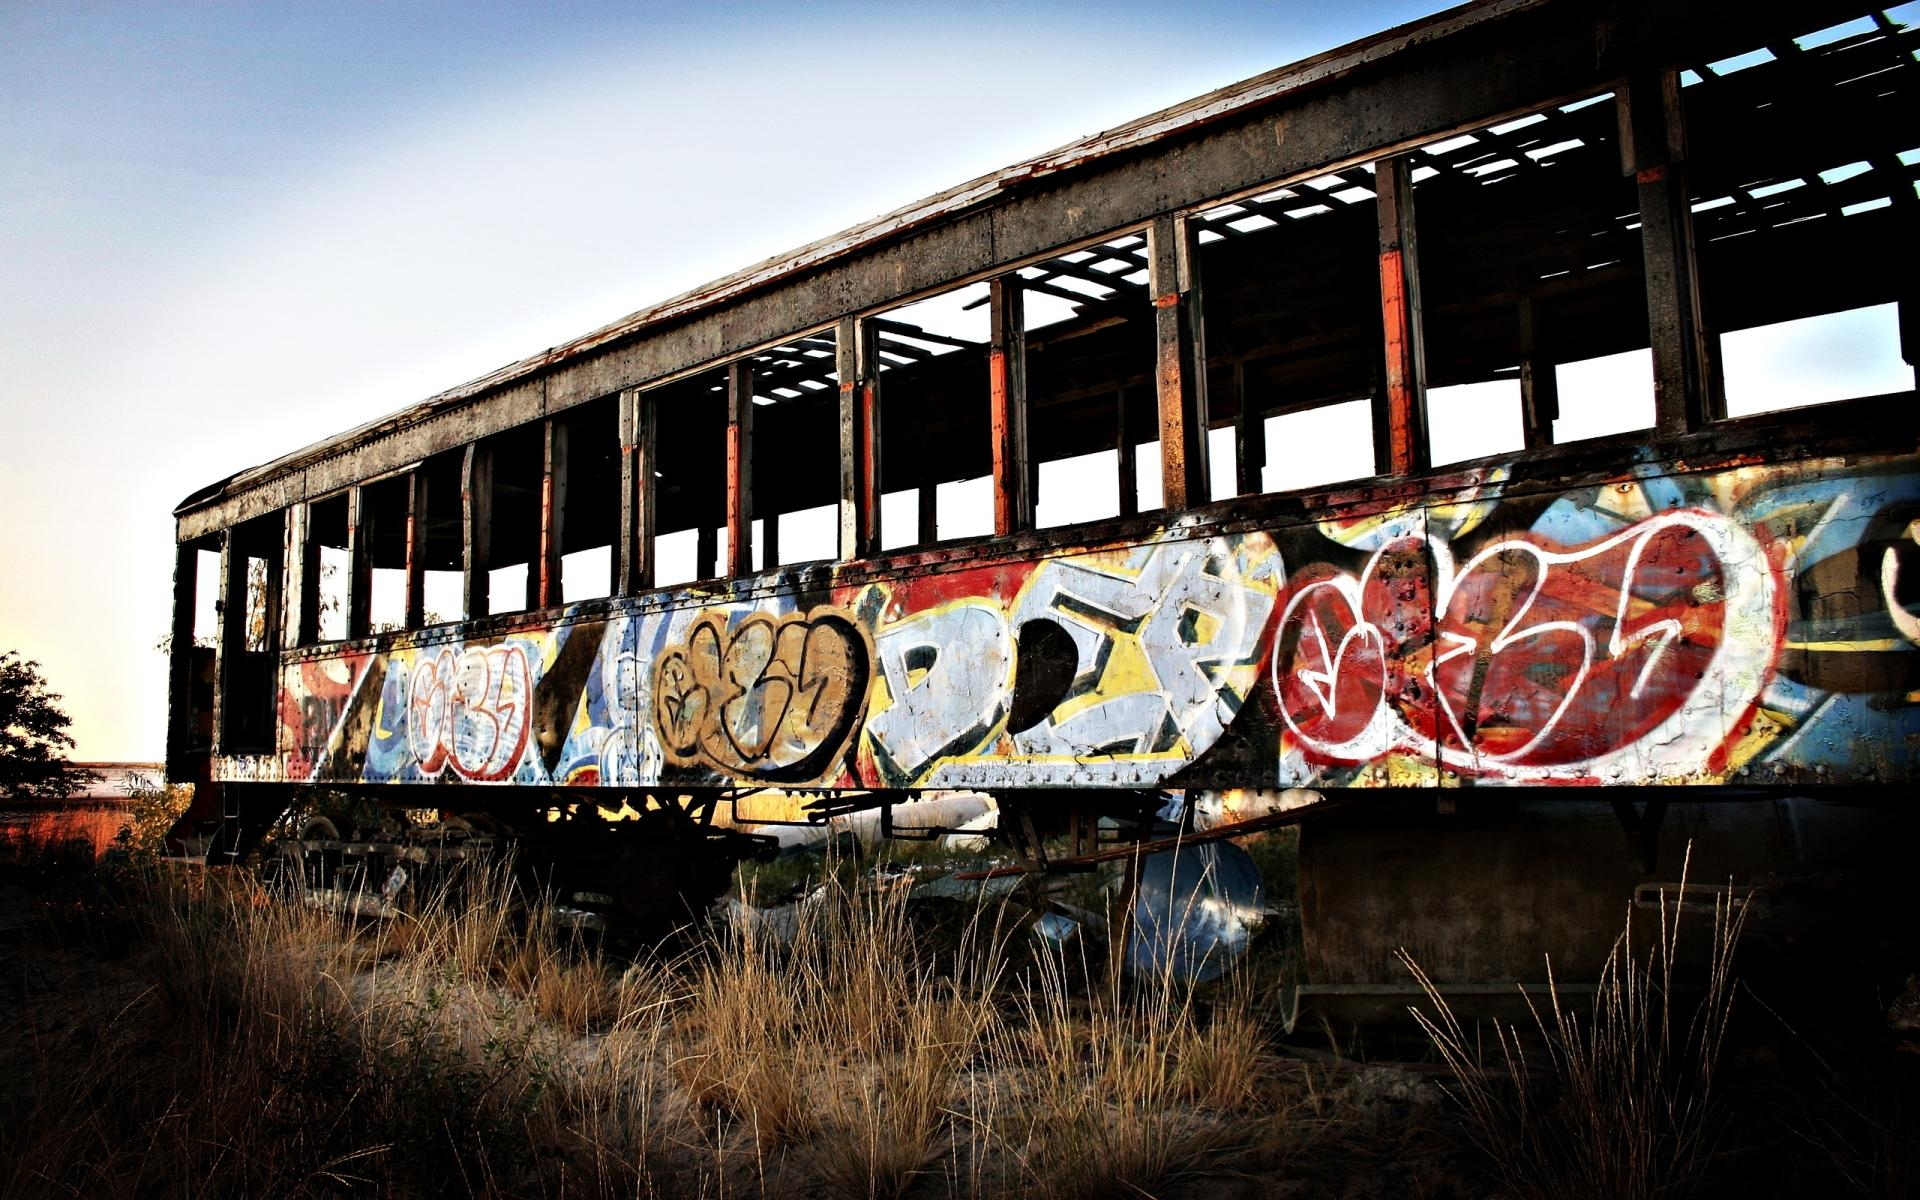 Graffiti Artistic wallpapers HD quality